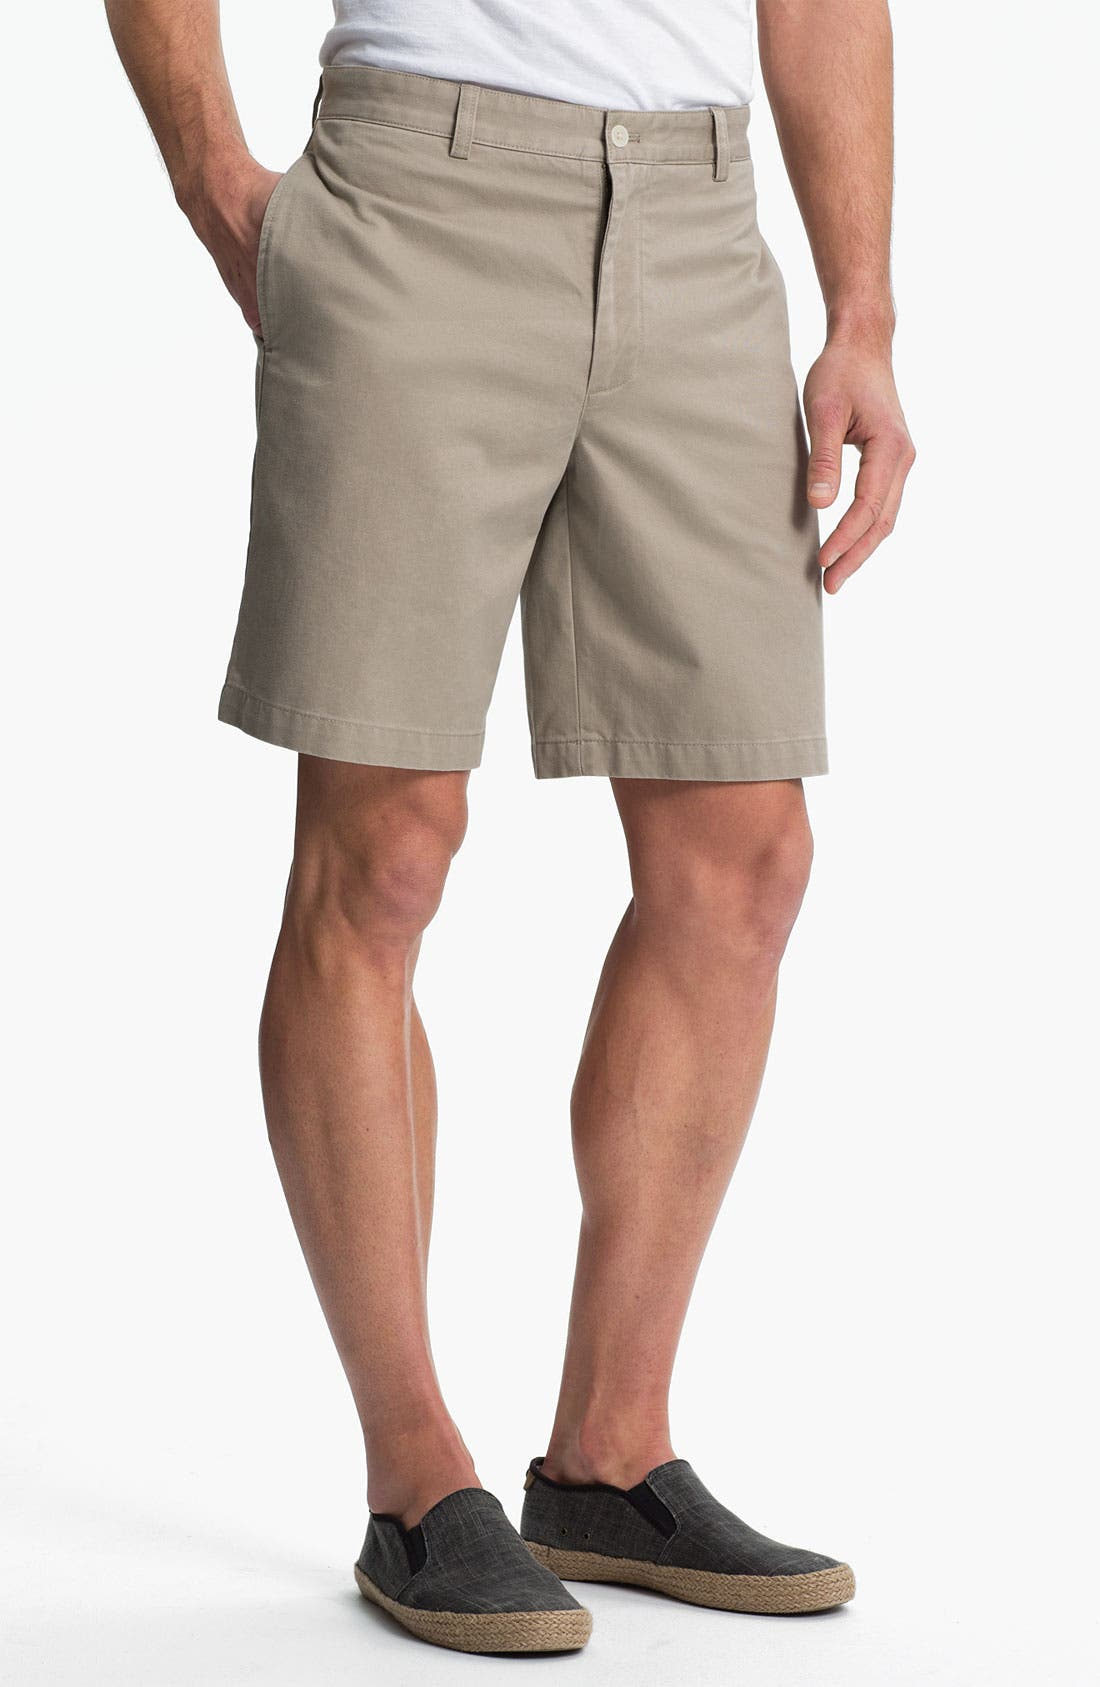 Main Image - Vineyard Vines 'Club' Flat Front Twill Shorts